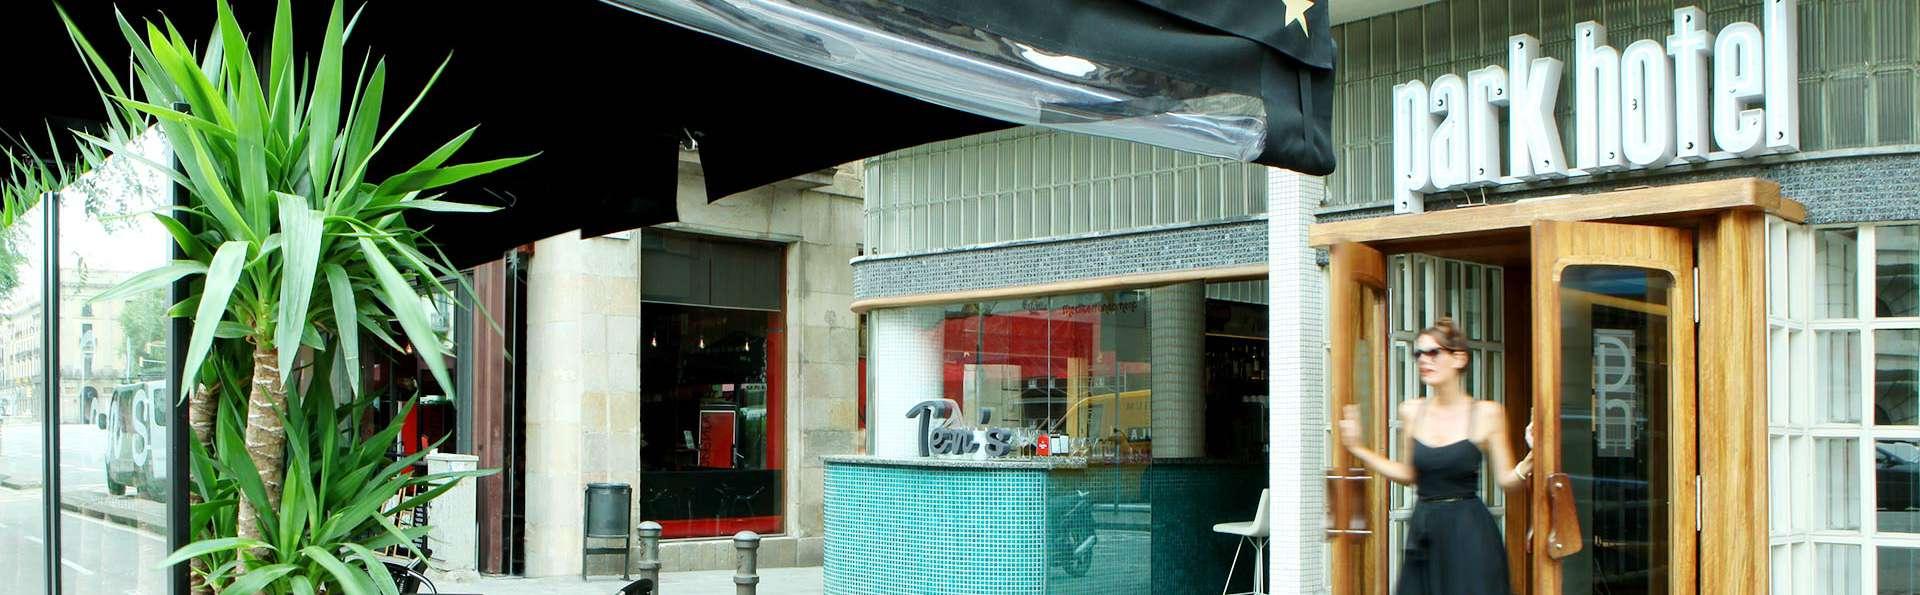 Park Hotel Barcelona - EDIT_TERRACE_01.jpg